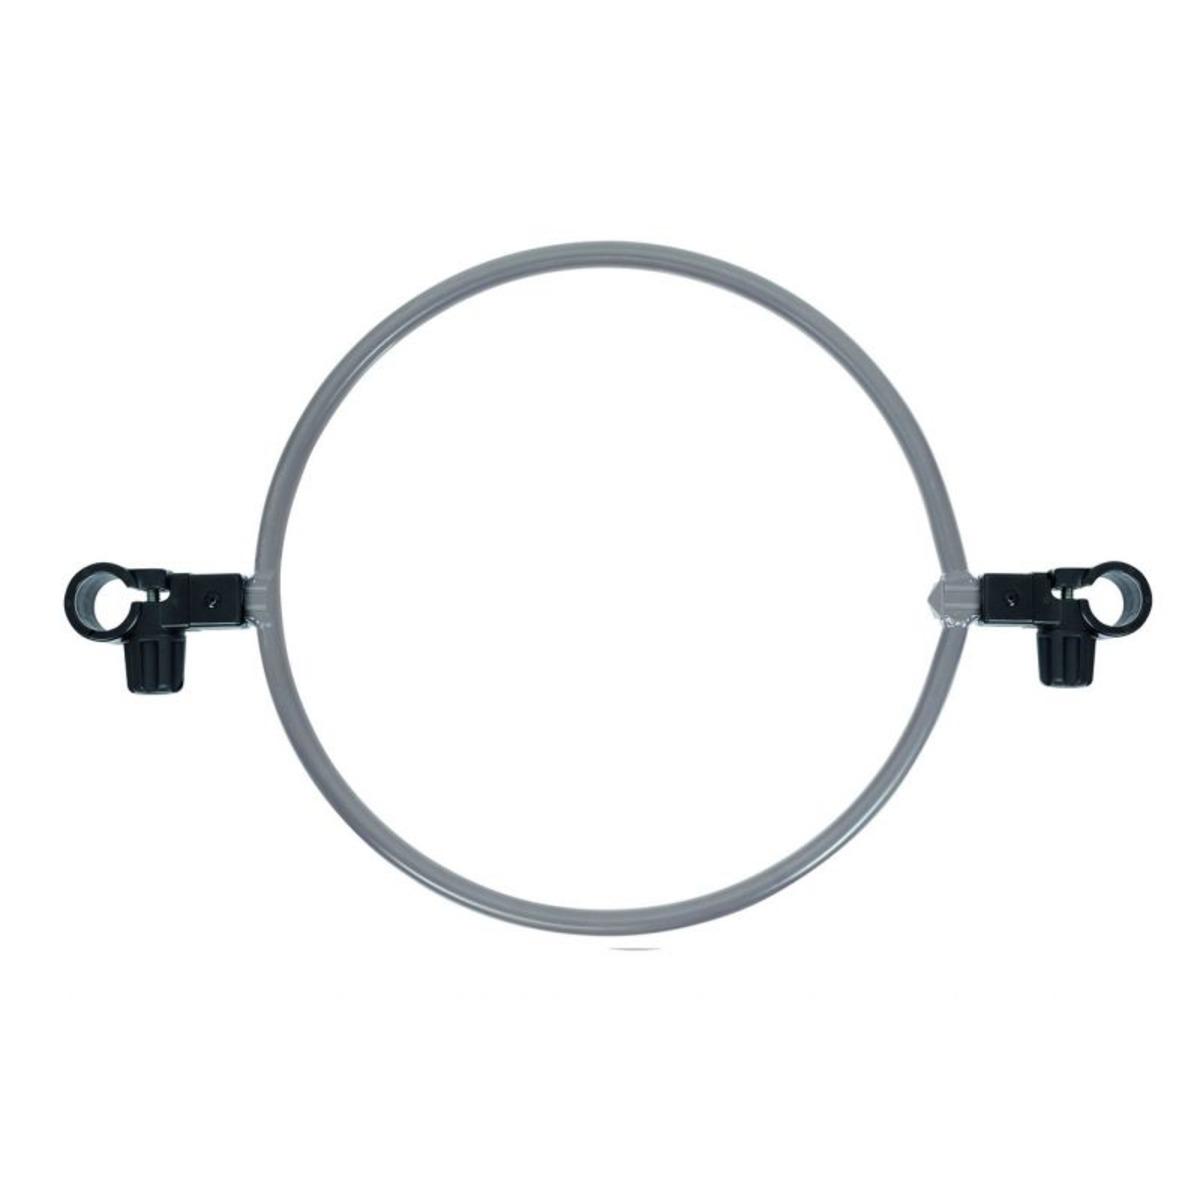 Colmic Aluminium Ring doppelte Klammer - Durchmesser 33 cm - Eimer 12 lt - Schüssel 5 lt